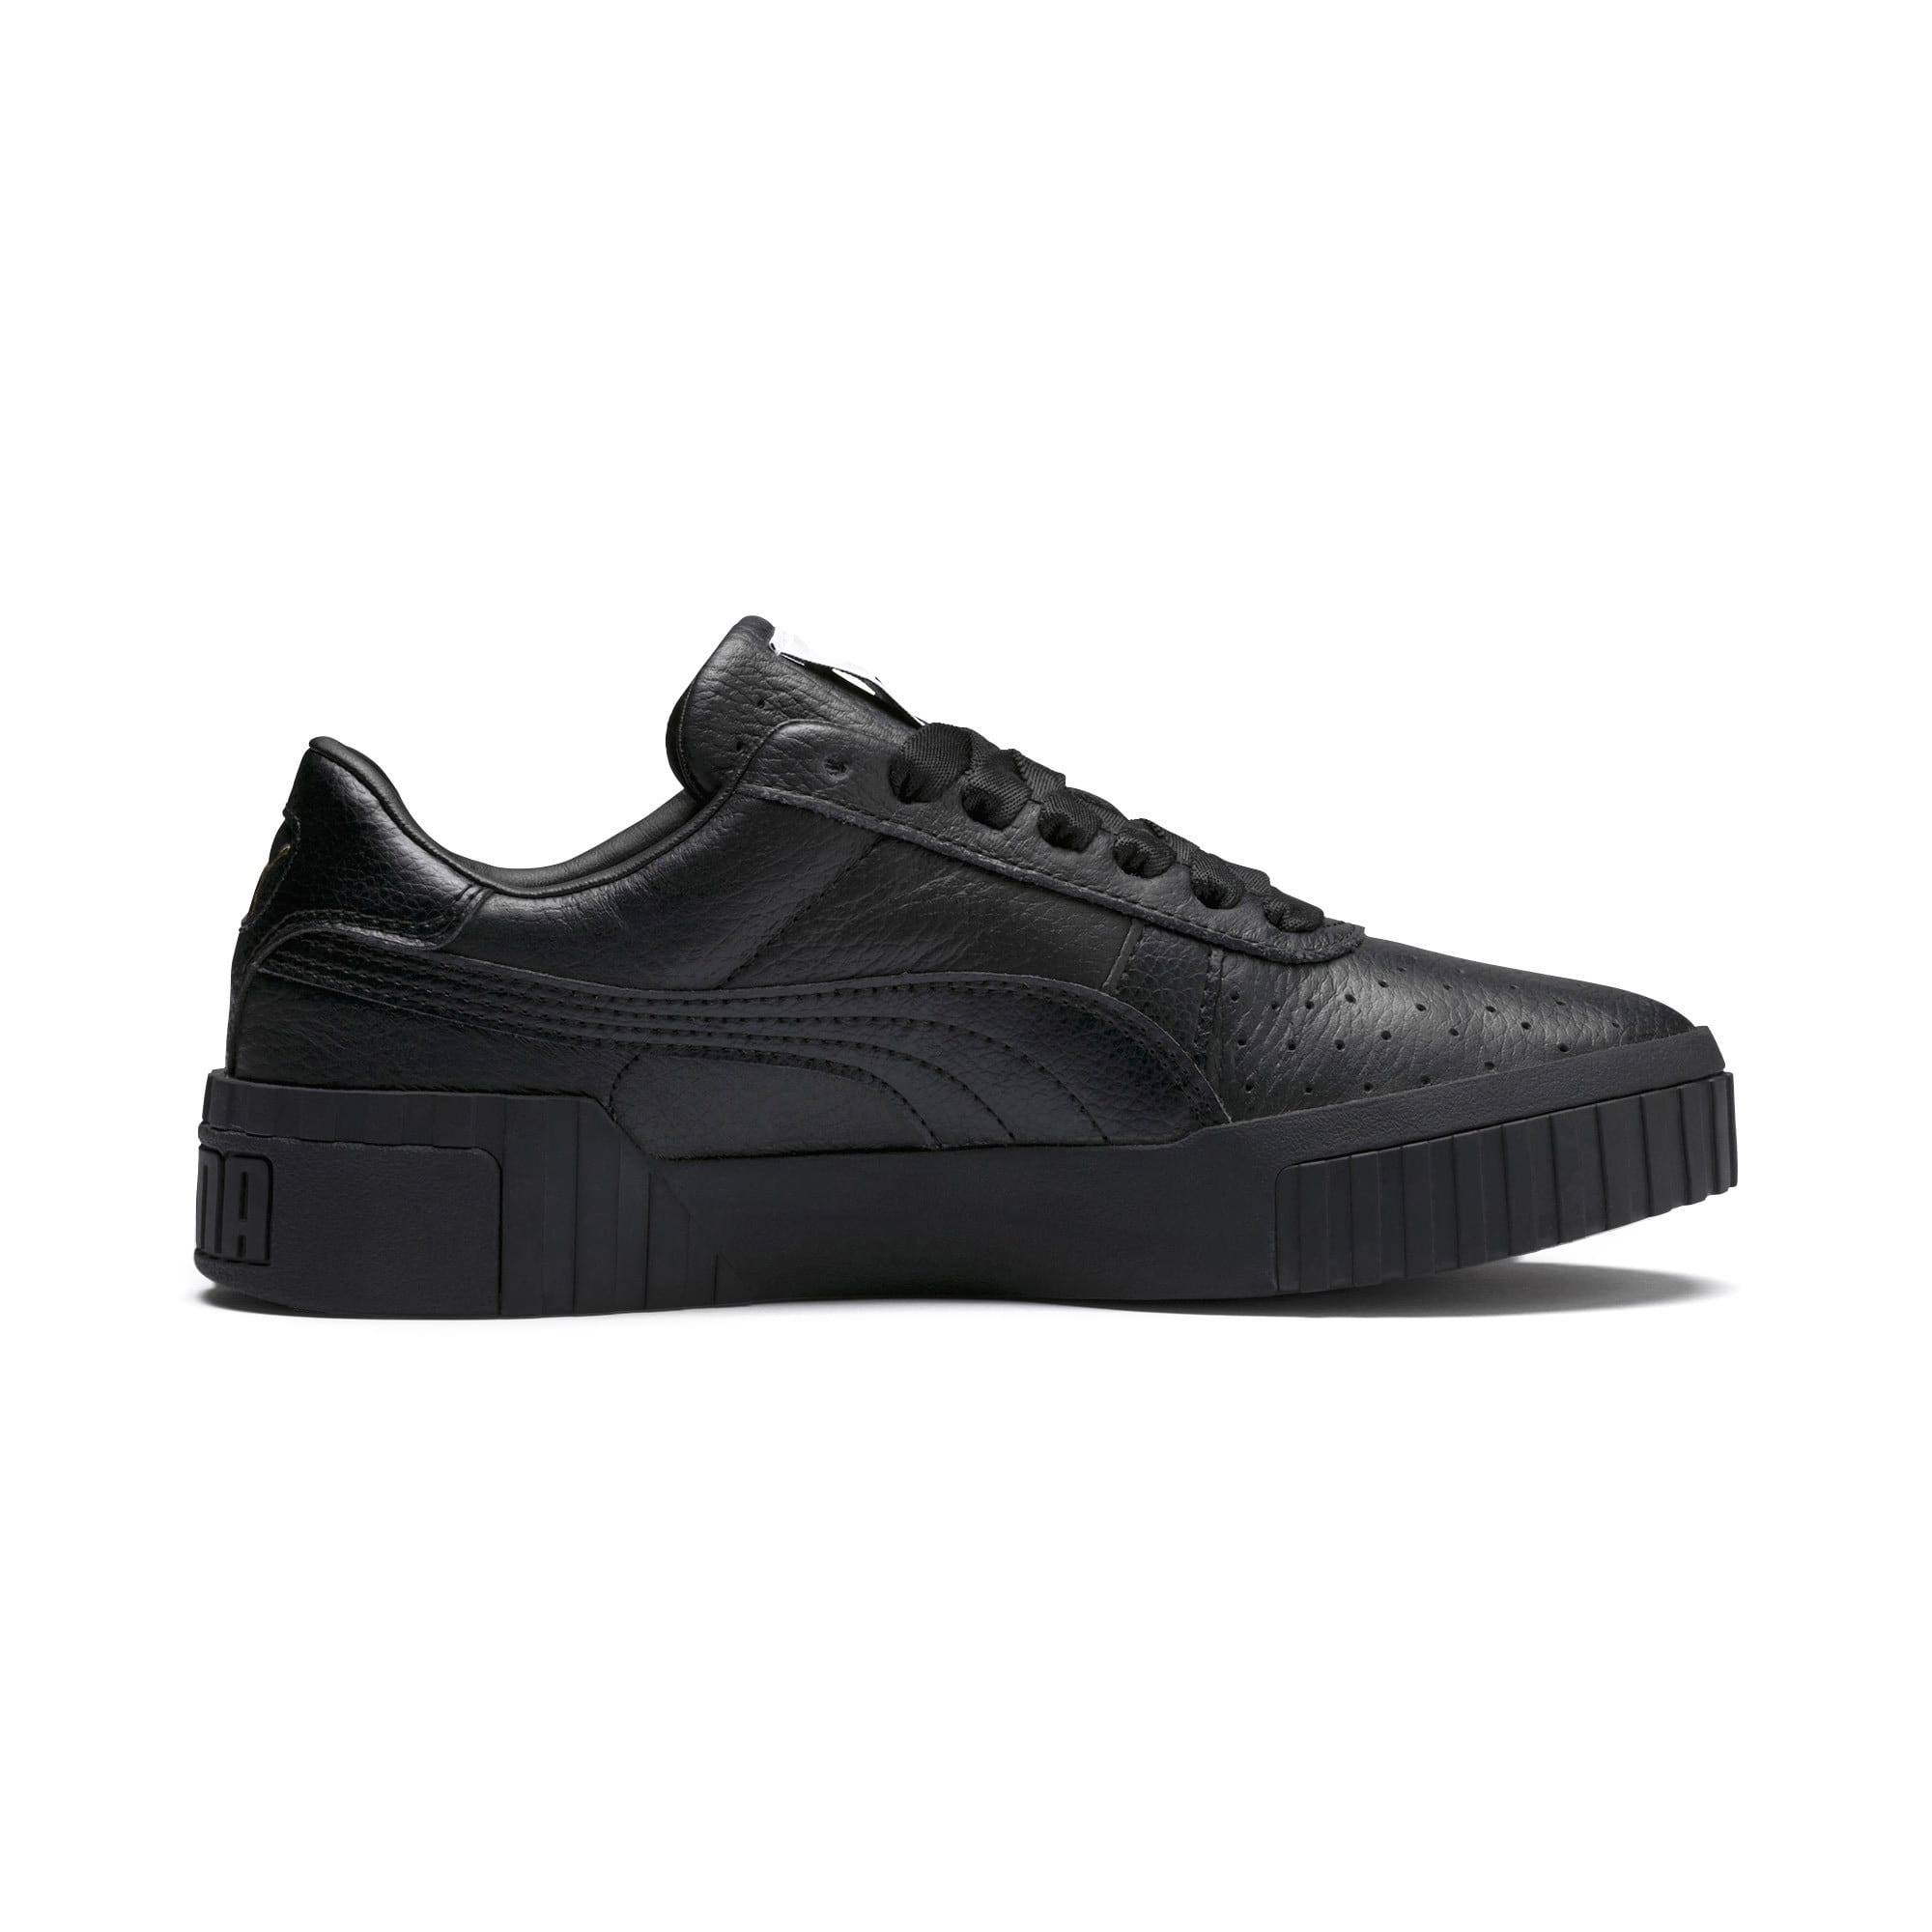 Thumbnail 6 of Sneakers Cali donna, Puma Black-Puma Black, medium